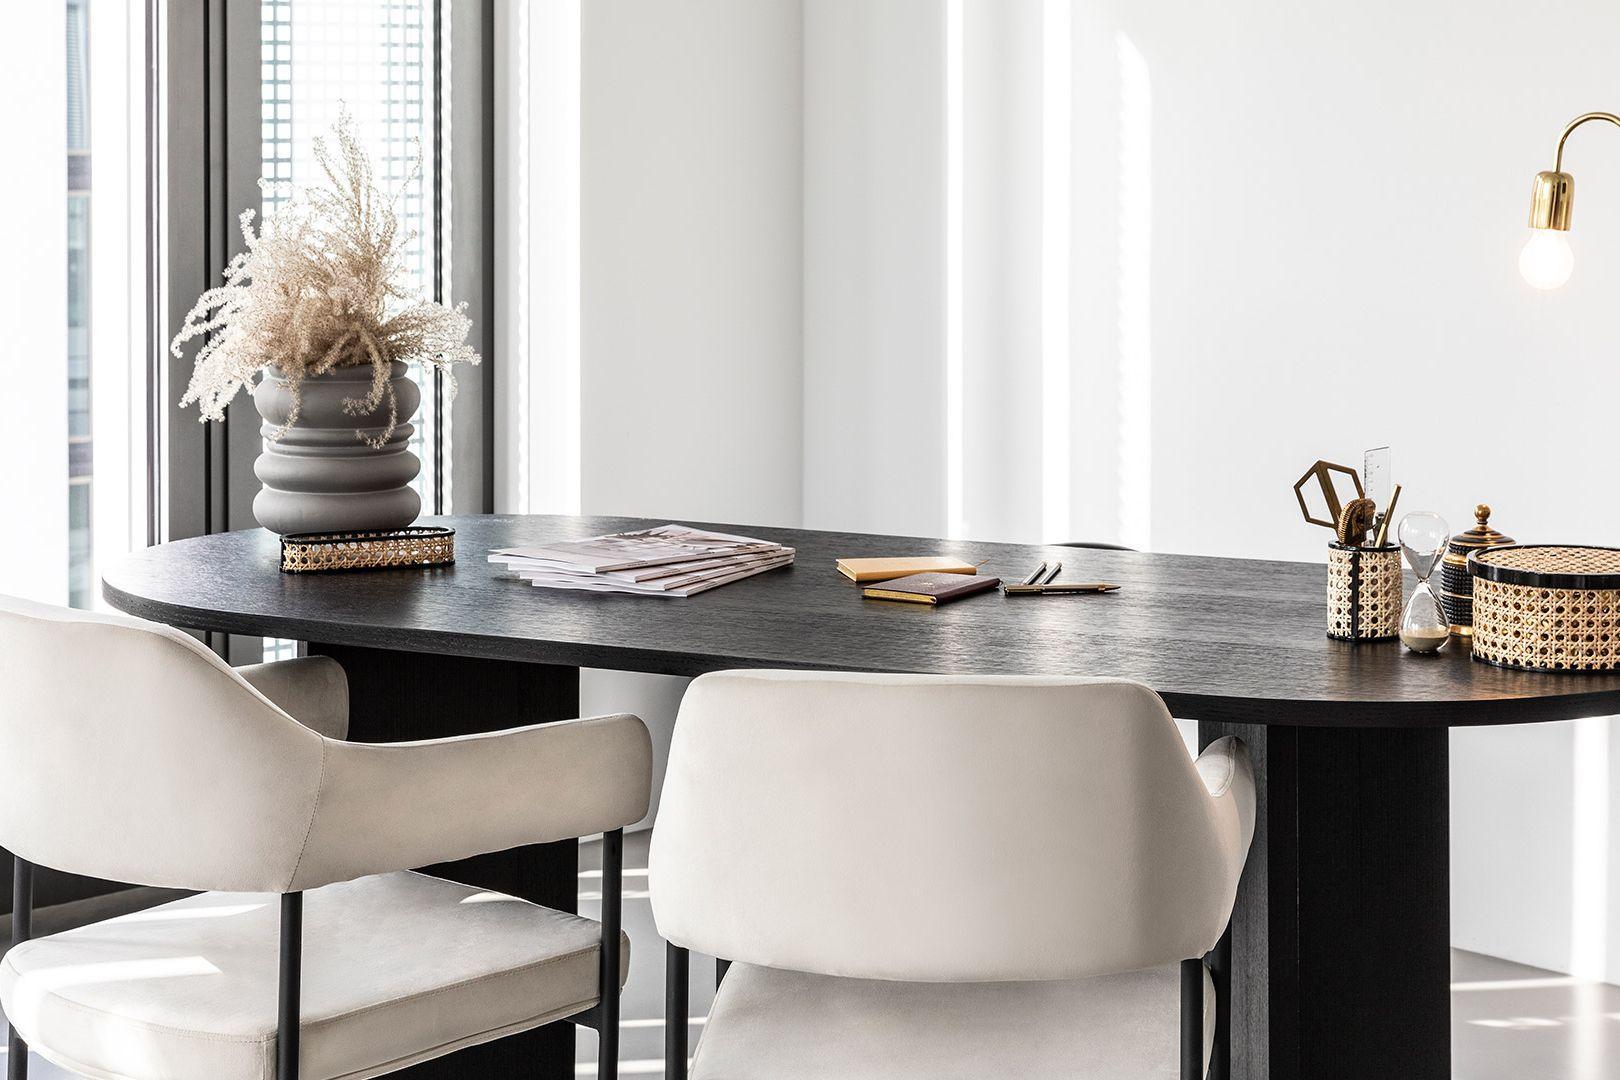 Oficina con estilo